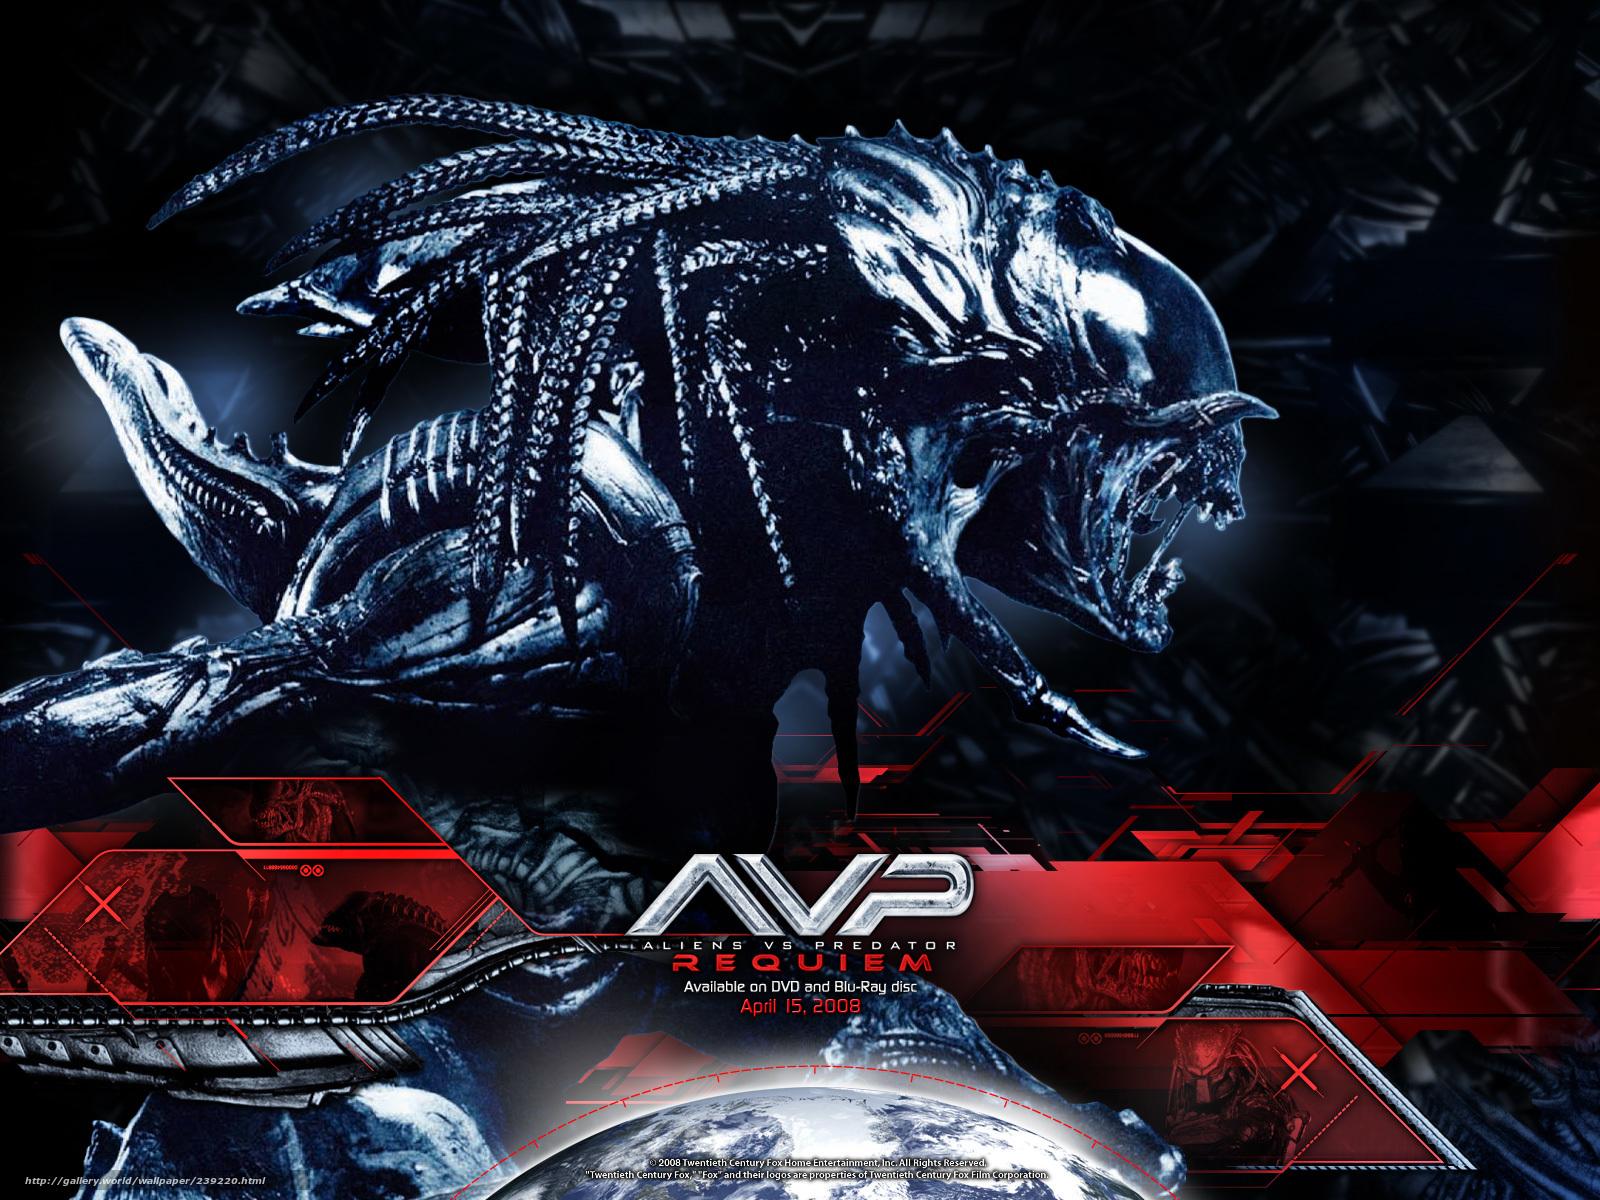 239220 chuzhie protiv xishhnika rekviem avpr aliens vs 1600x1200